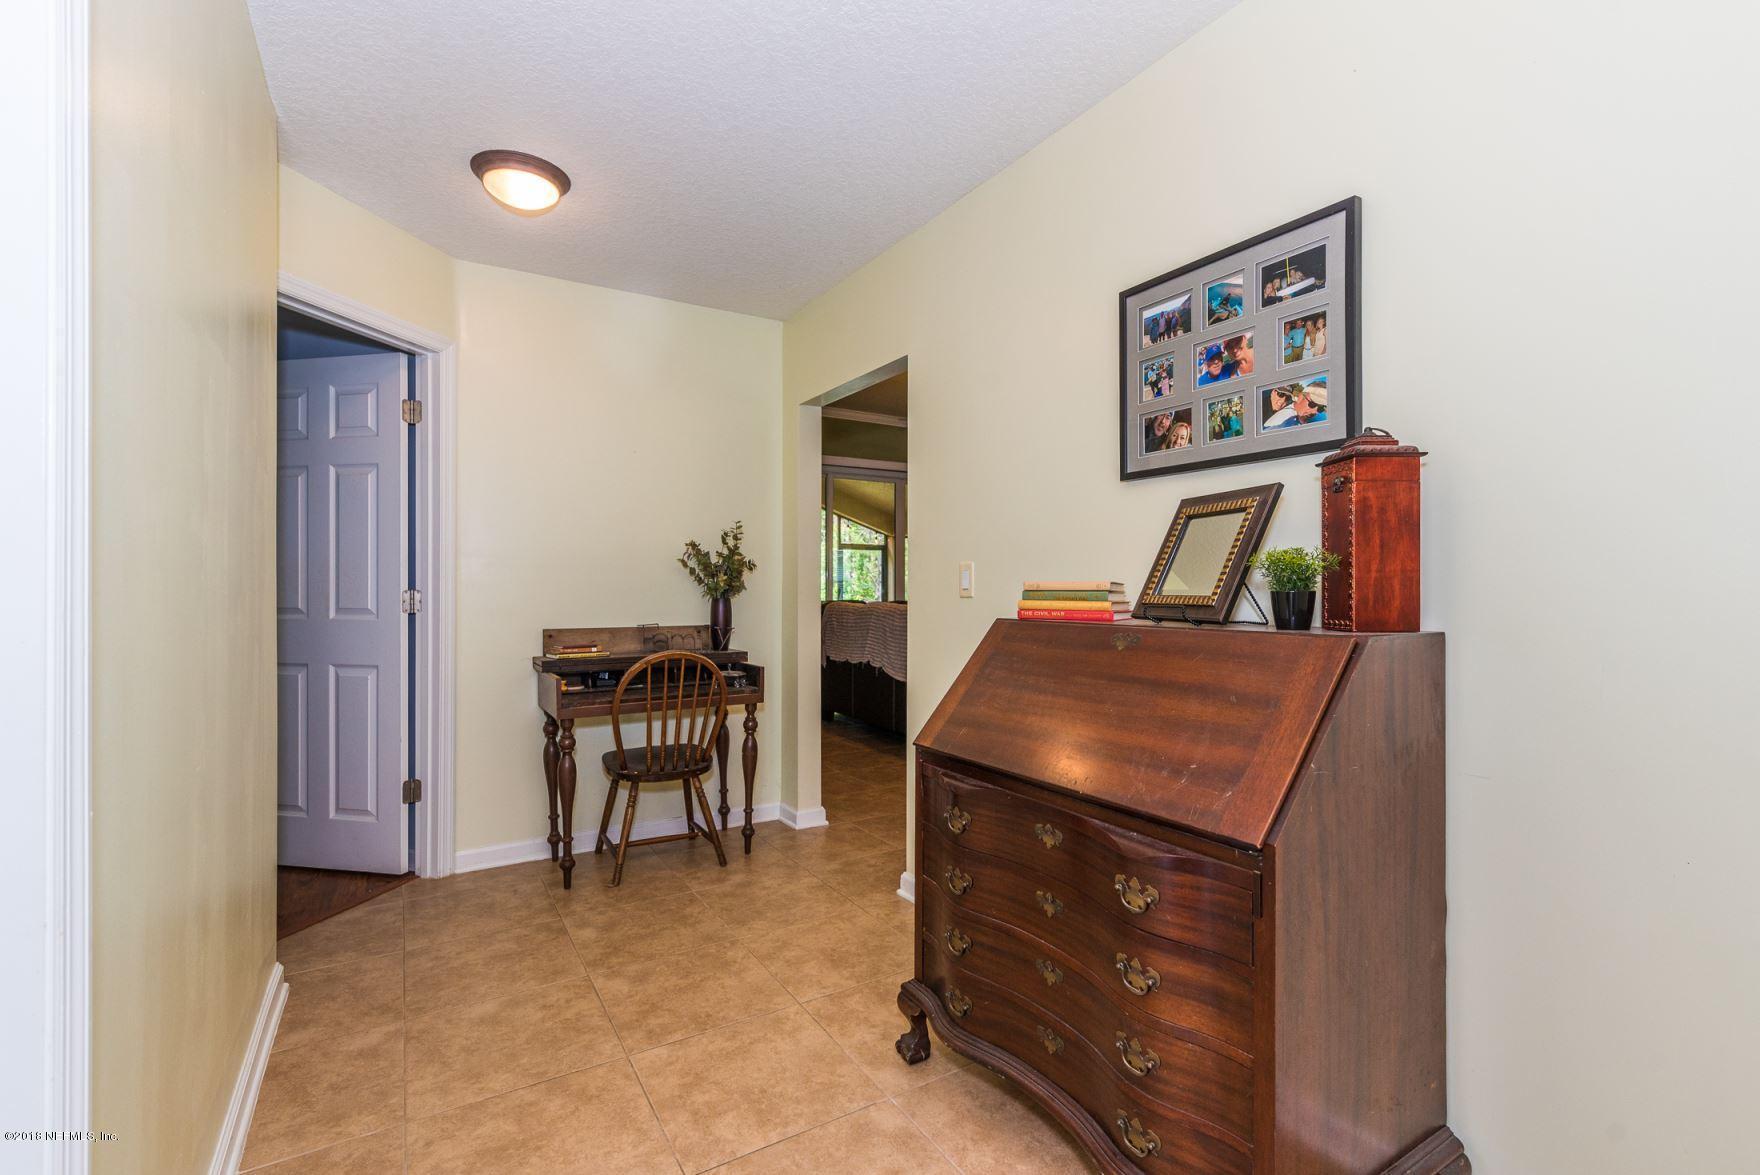 468 CASA SEVILLA, ST AUGUSTINE, FLORIDA 32092, 4 Bedrooms Bedrooms, ,2 BathroomsBathrooms,Residential - single family,For sale,CASA SEVILLA,948265